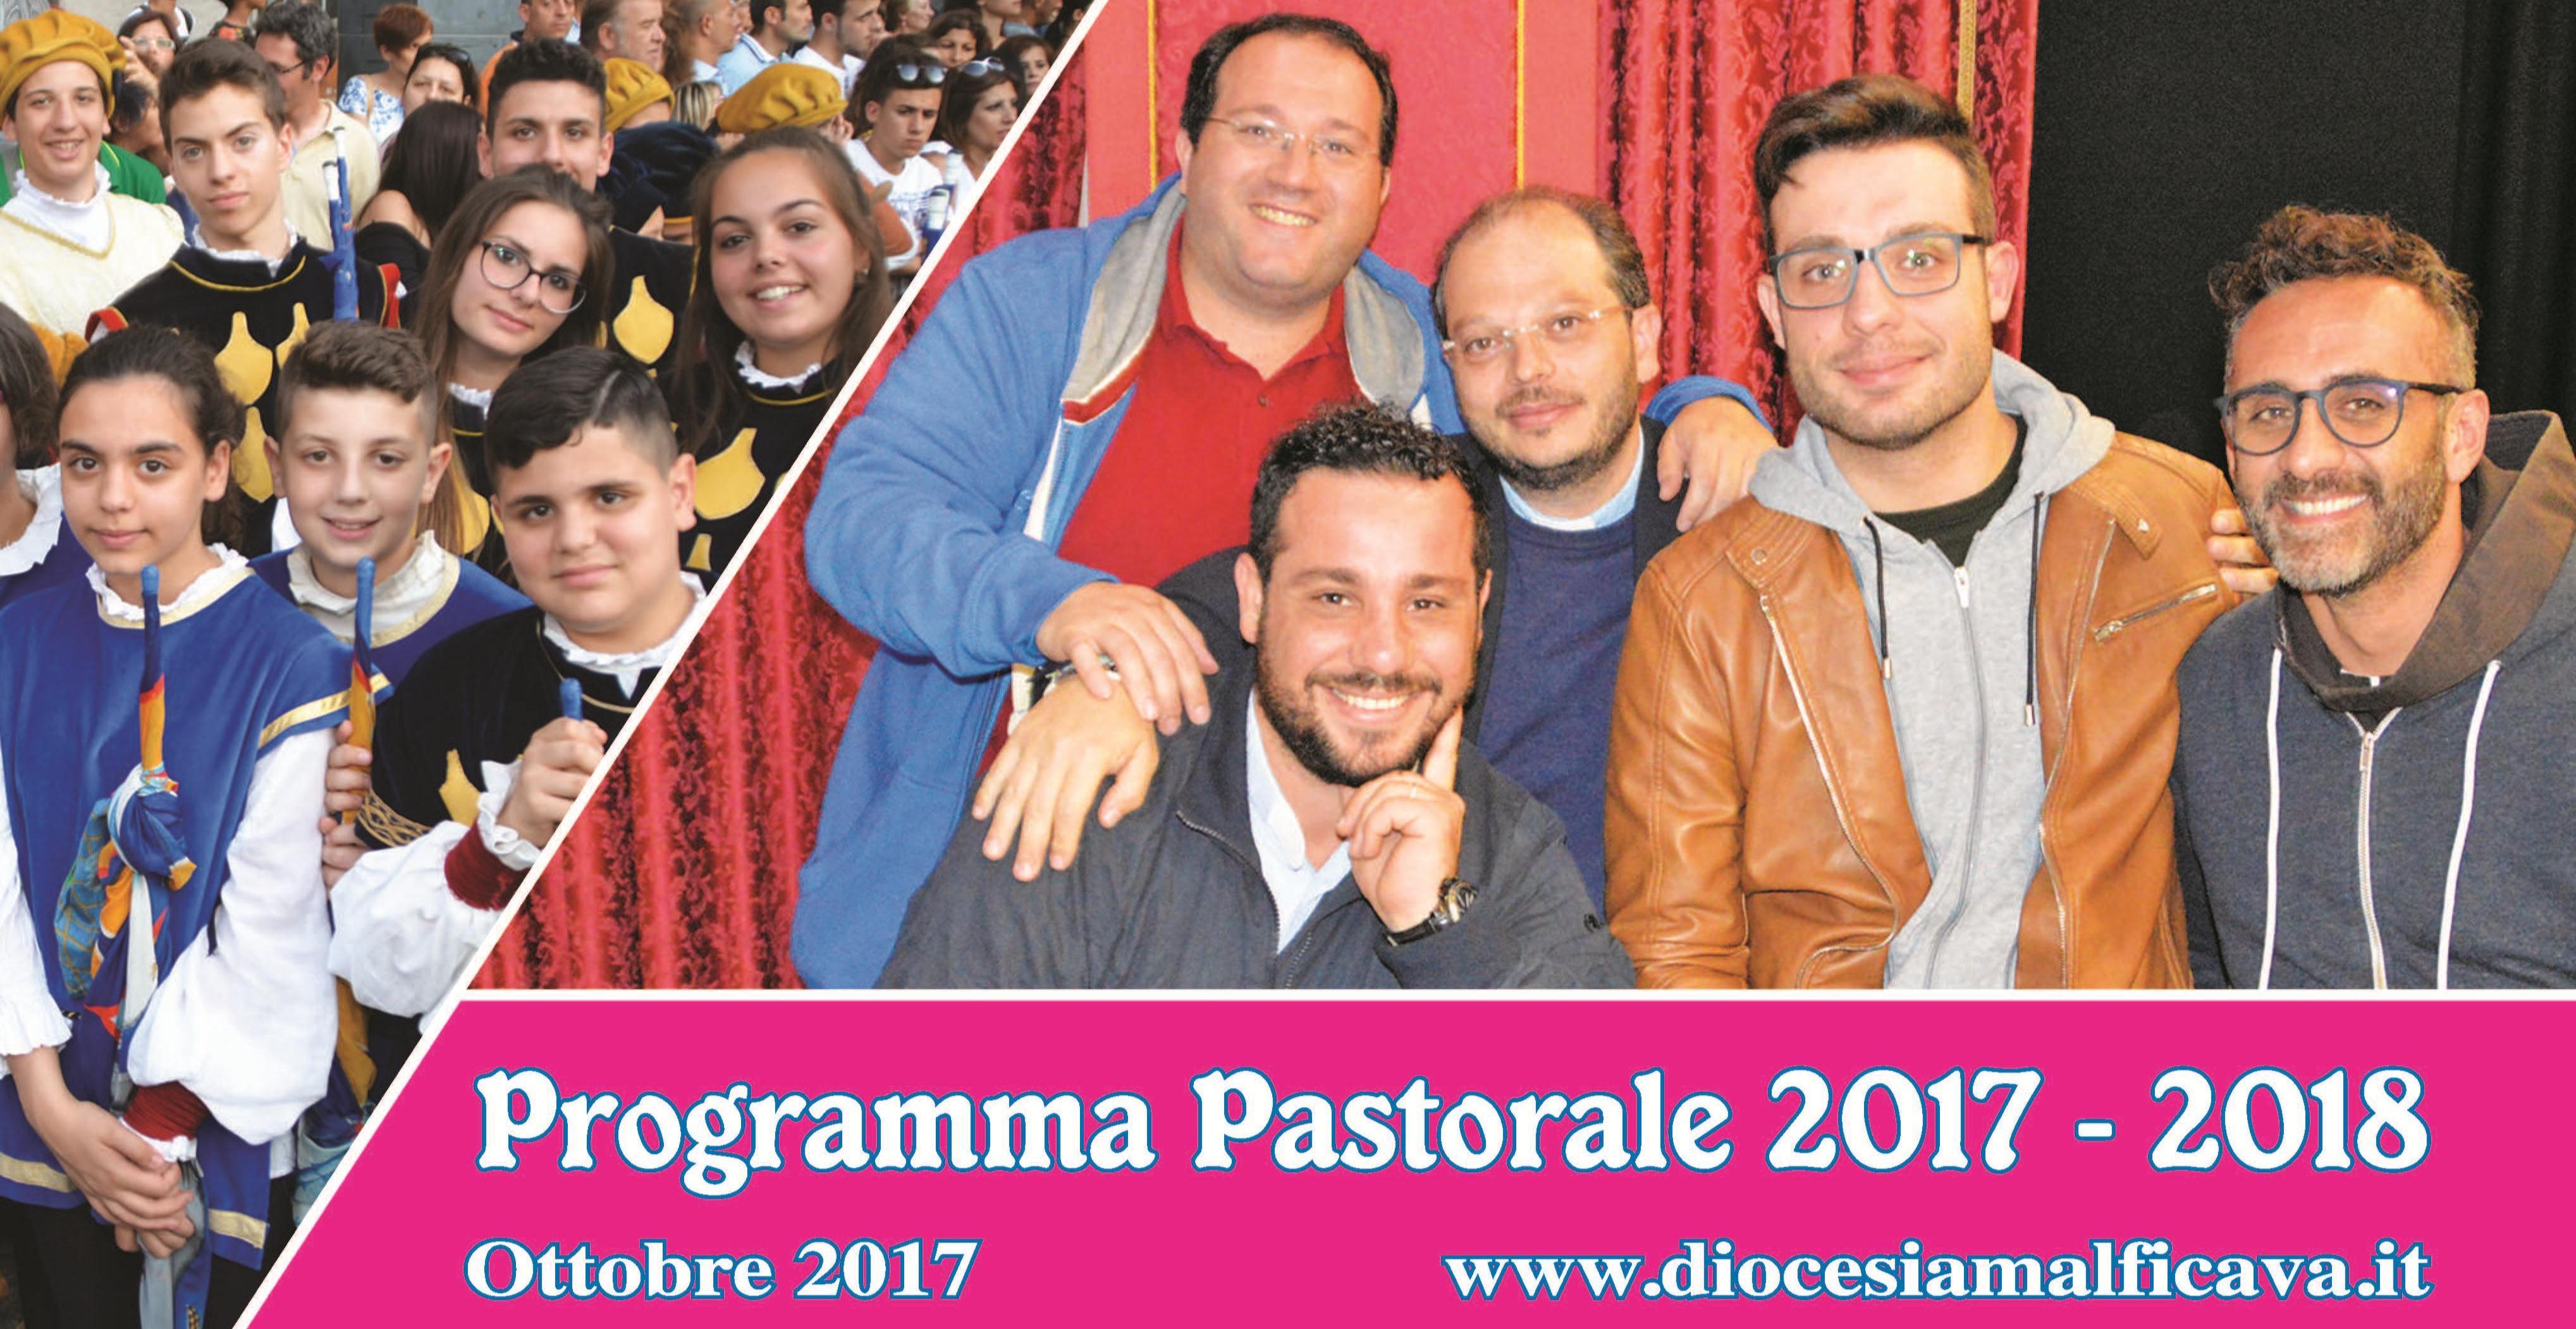 programma pastorale 2017-2018